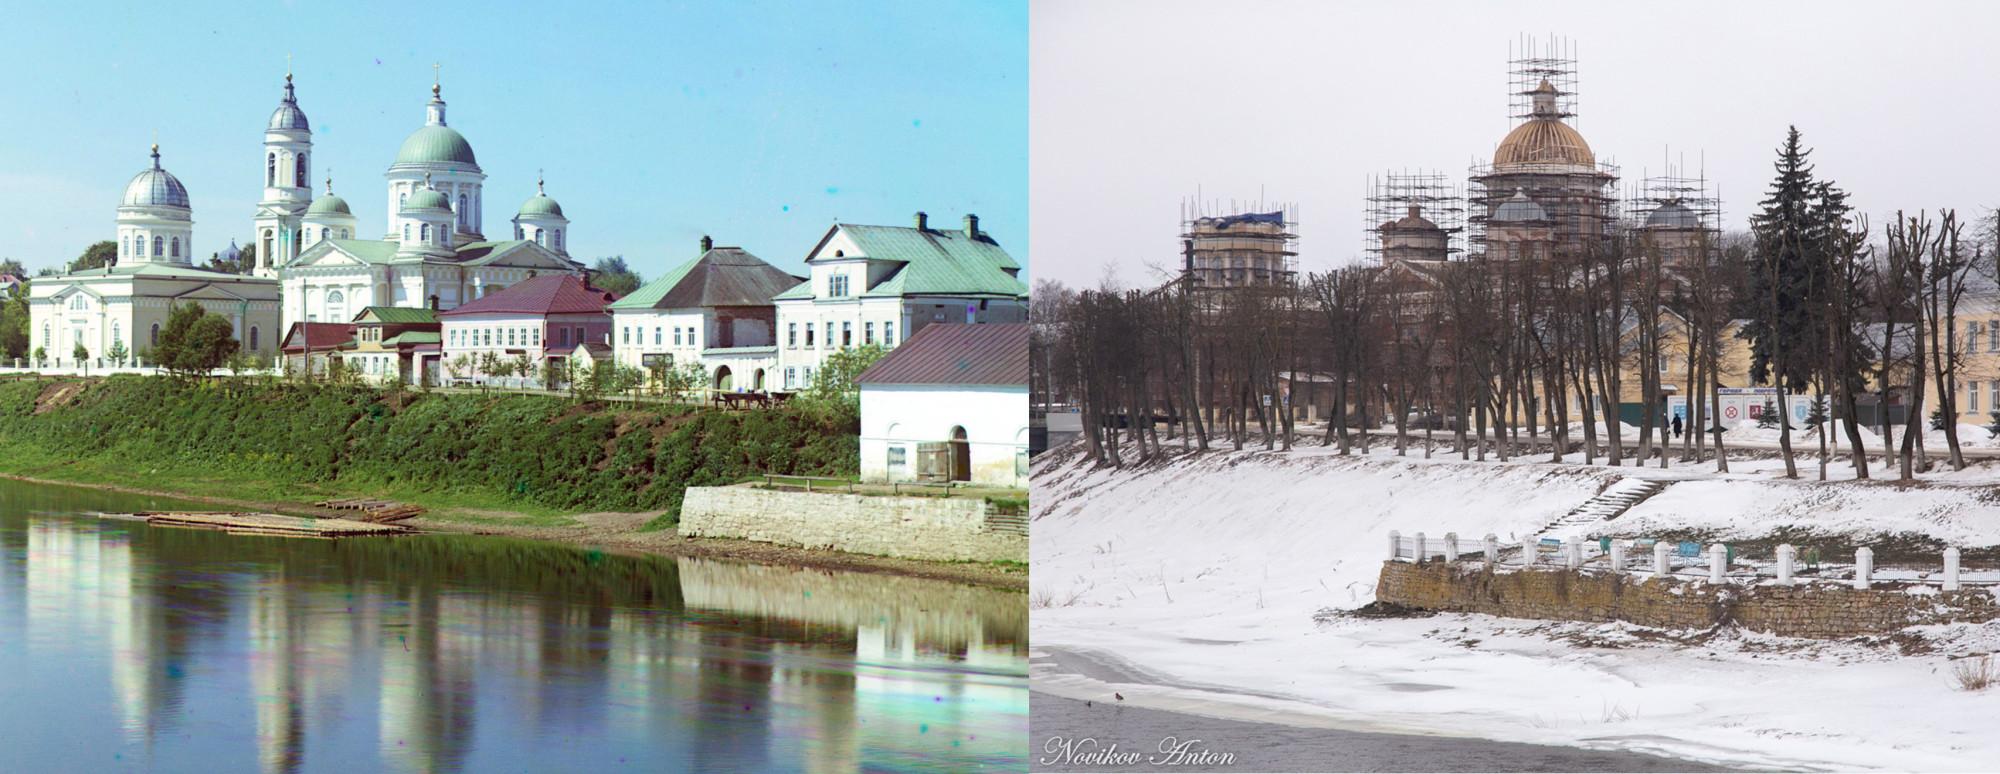 Вид на Спасо-Преображенский собор в Торжке 1910-2021